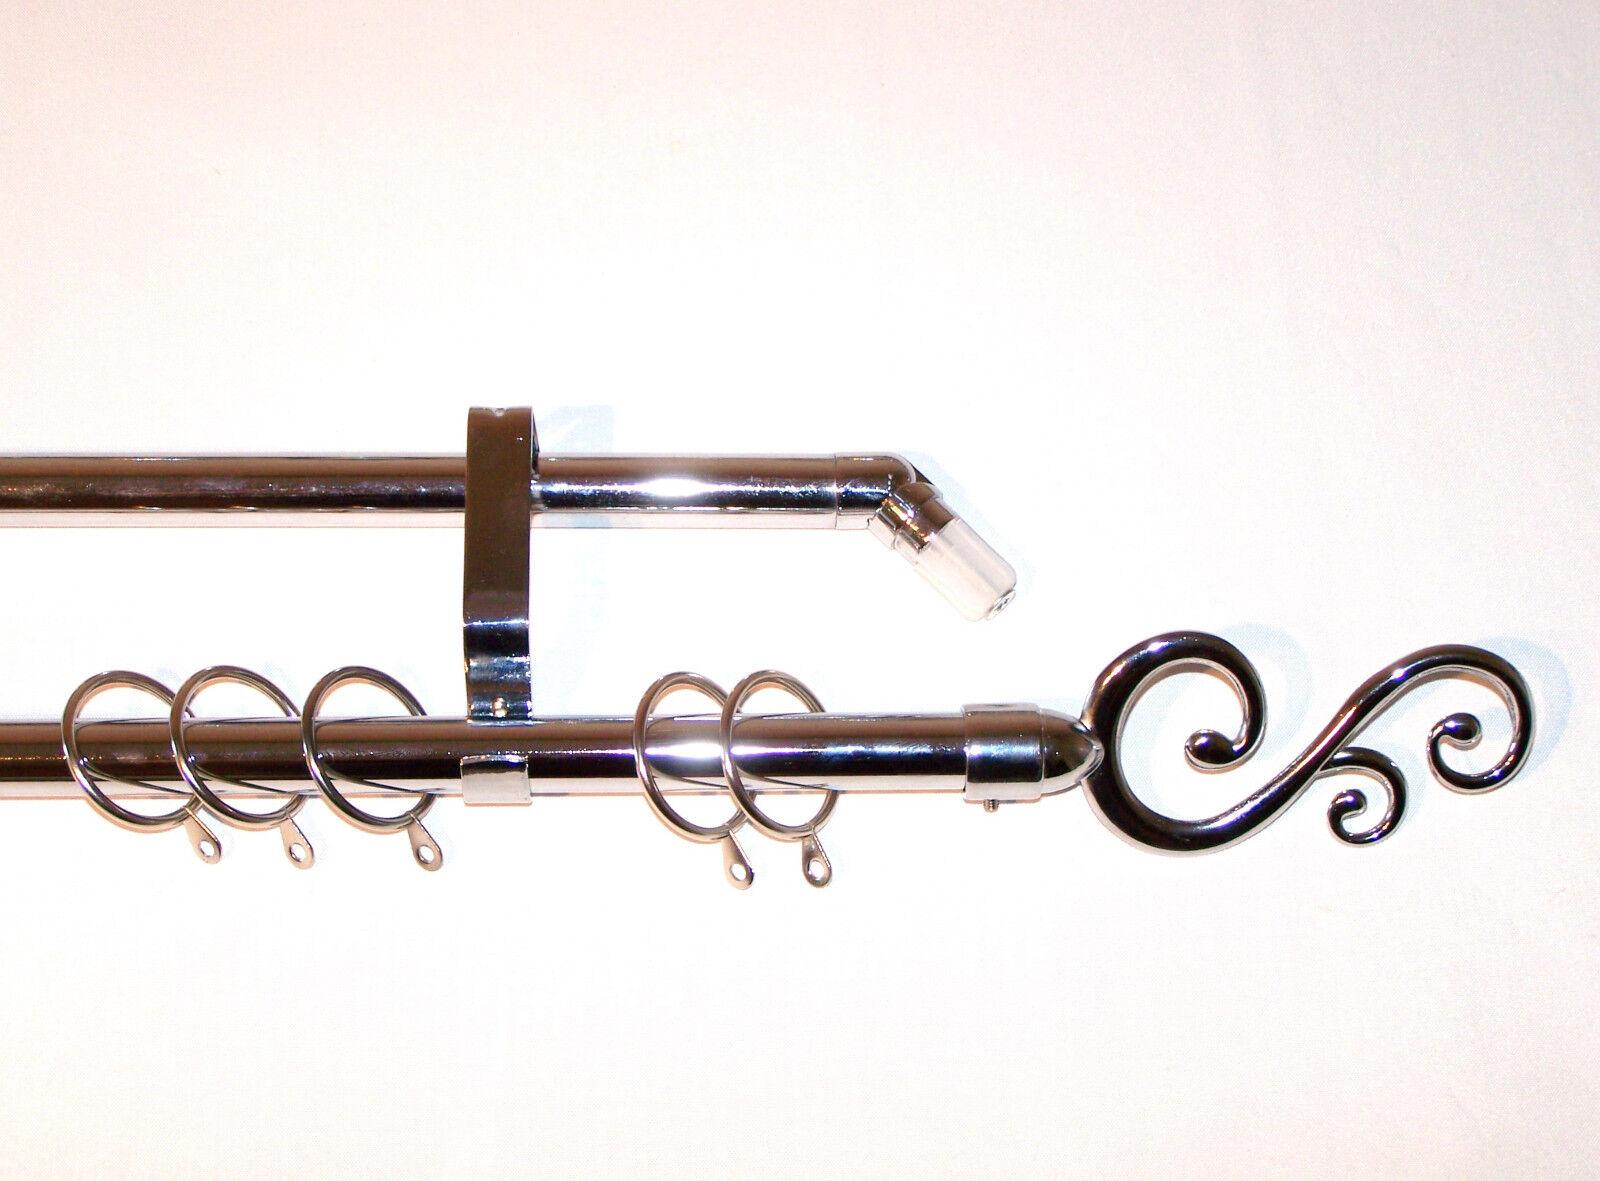 19mm CROMO Spirale bovindo Tenda Pole Sistema Spirale CROMO CURVO ornamenti 2.4m 240cm 3m 4fd7b4